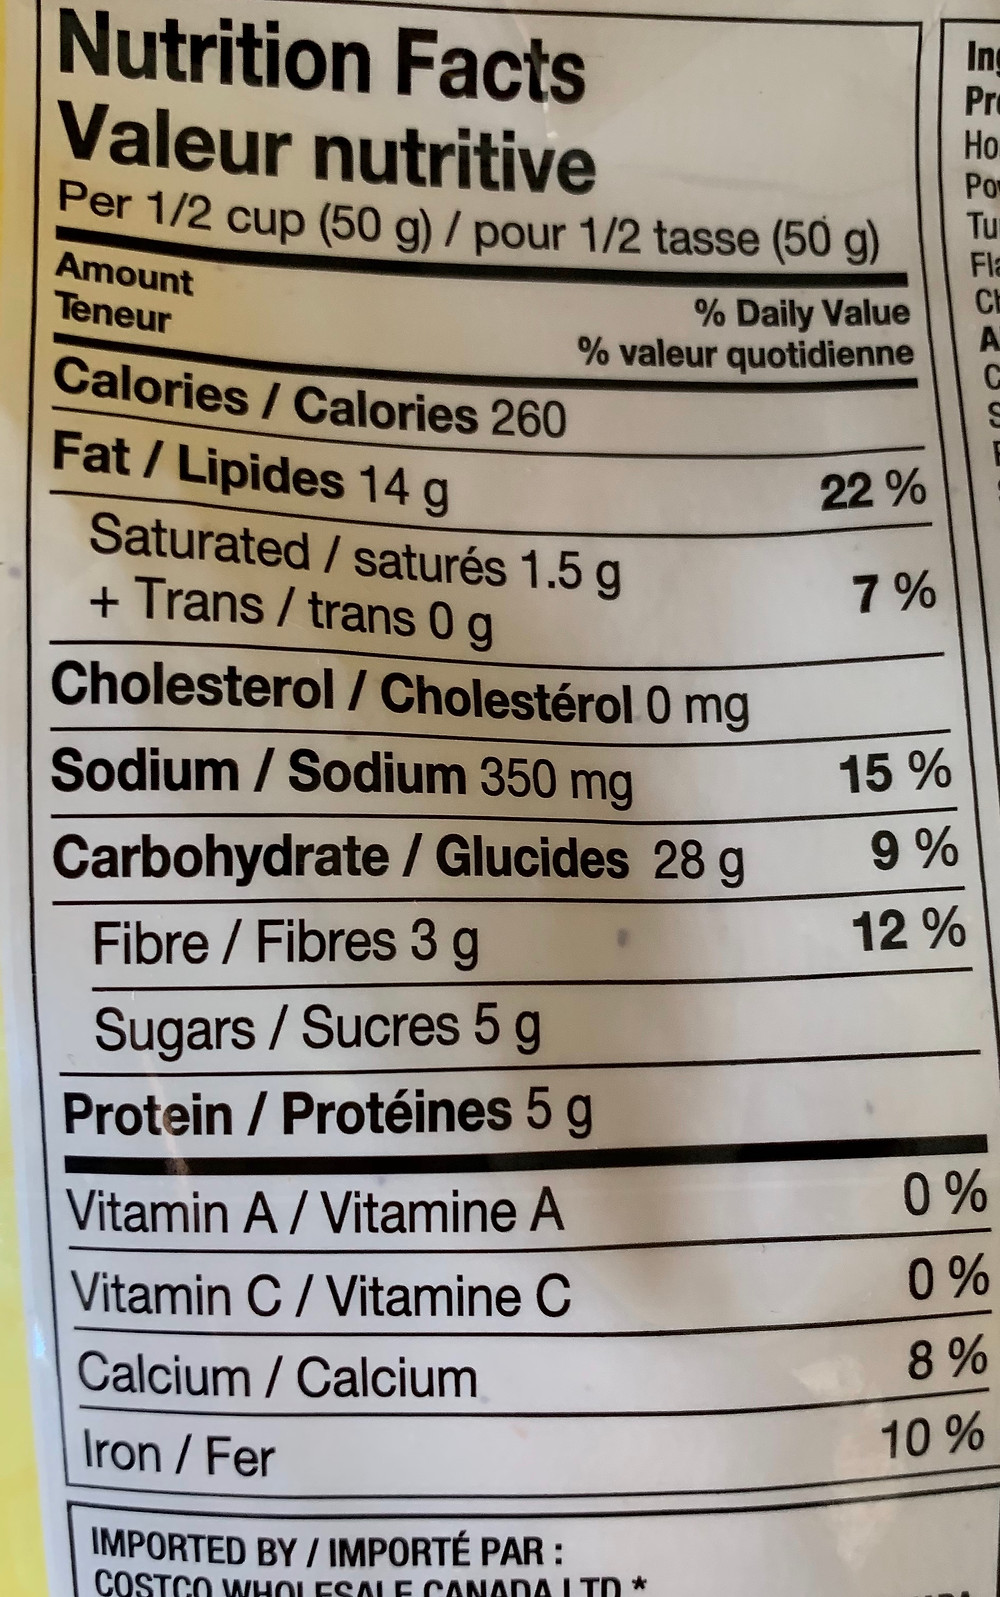 Costco Kirkland Signature Honey Mustard Snack Mix Nutrition